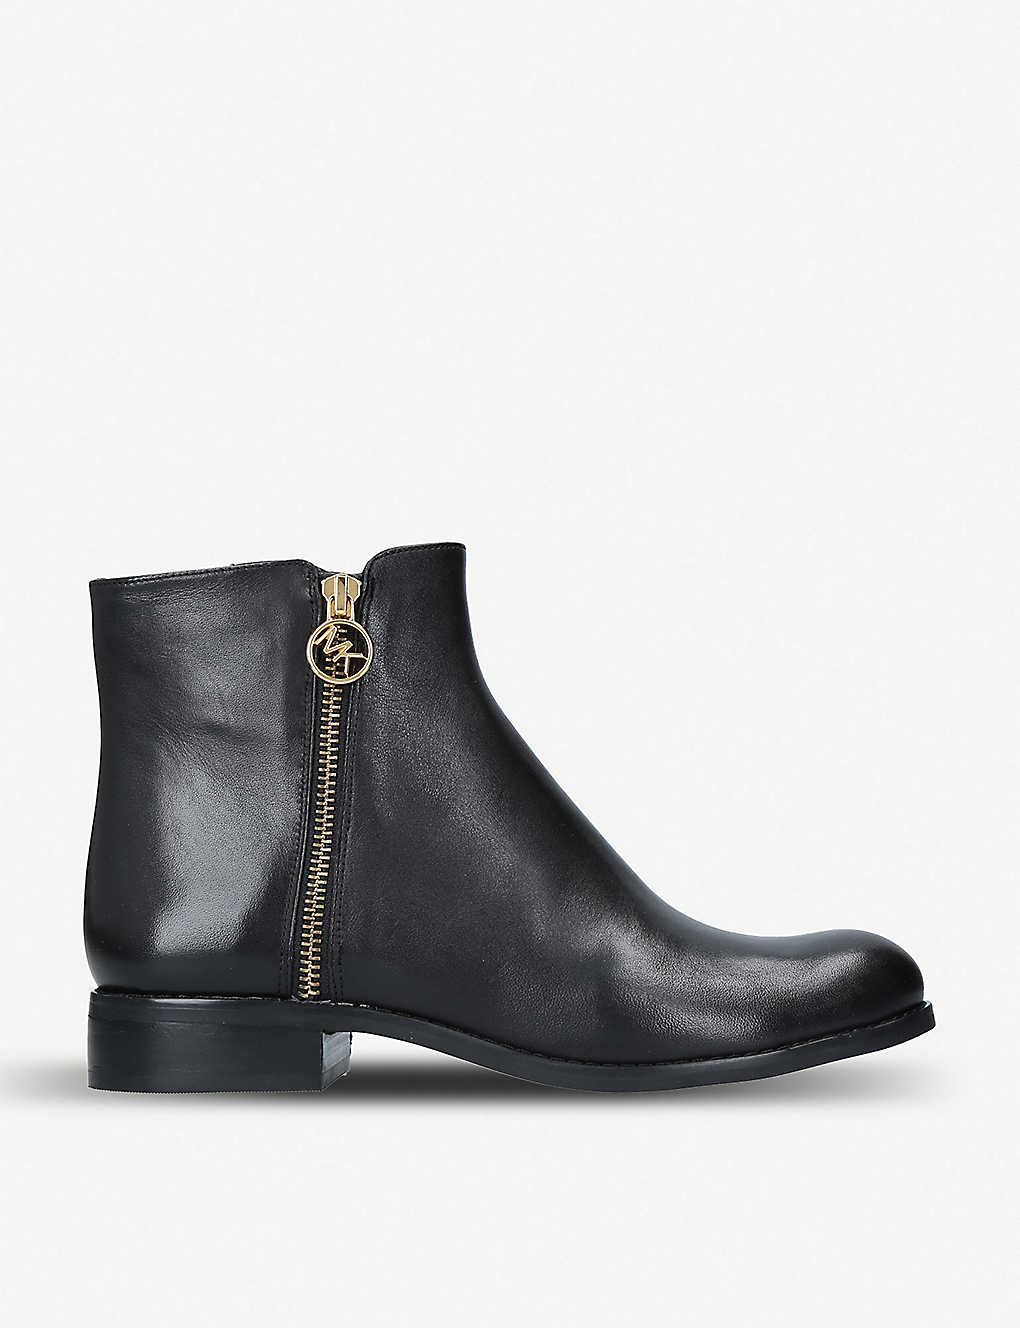 2519a7675251 MICHAEL MICHAEL KORS - Jaycie leather ankle boots